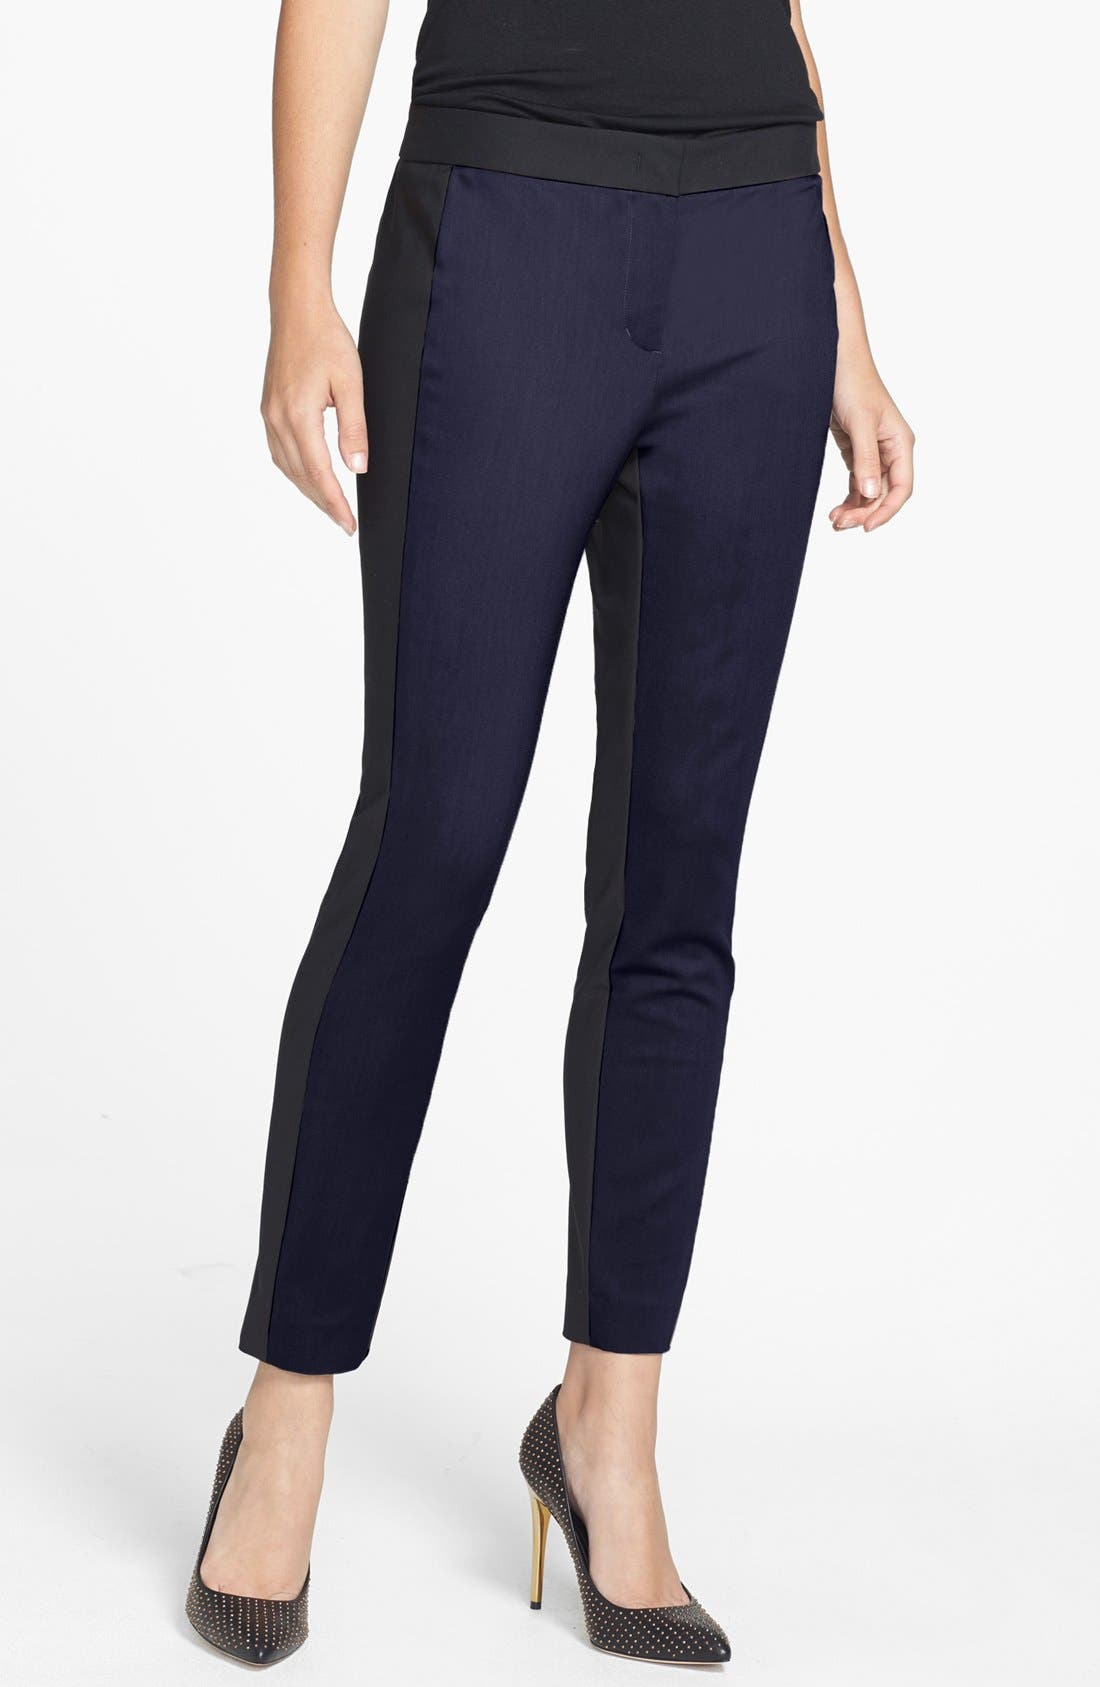 Alternate Image 1 Selected - DKNYC Colorblock Skinny Ankle Pants